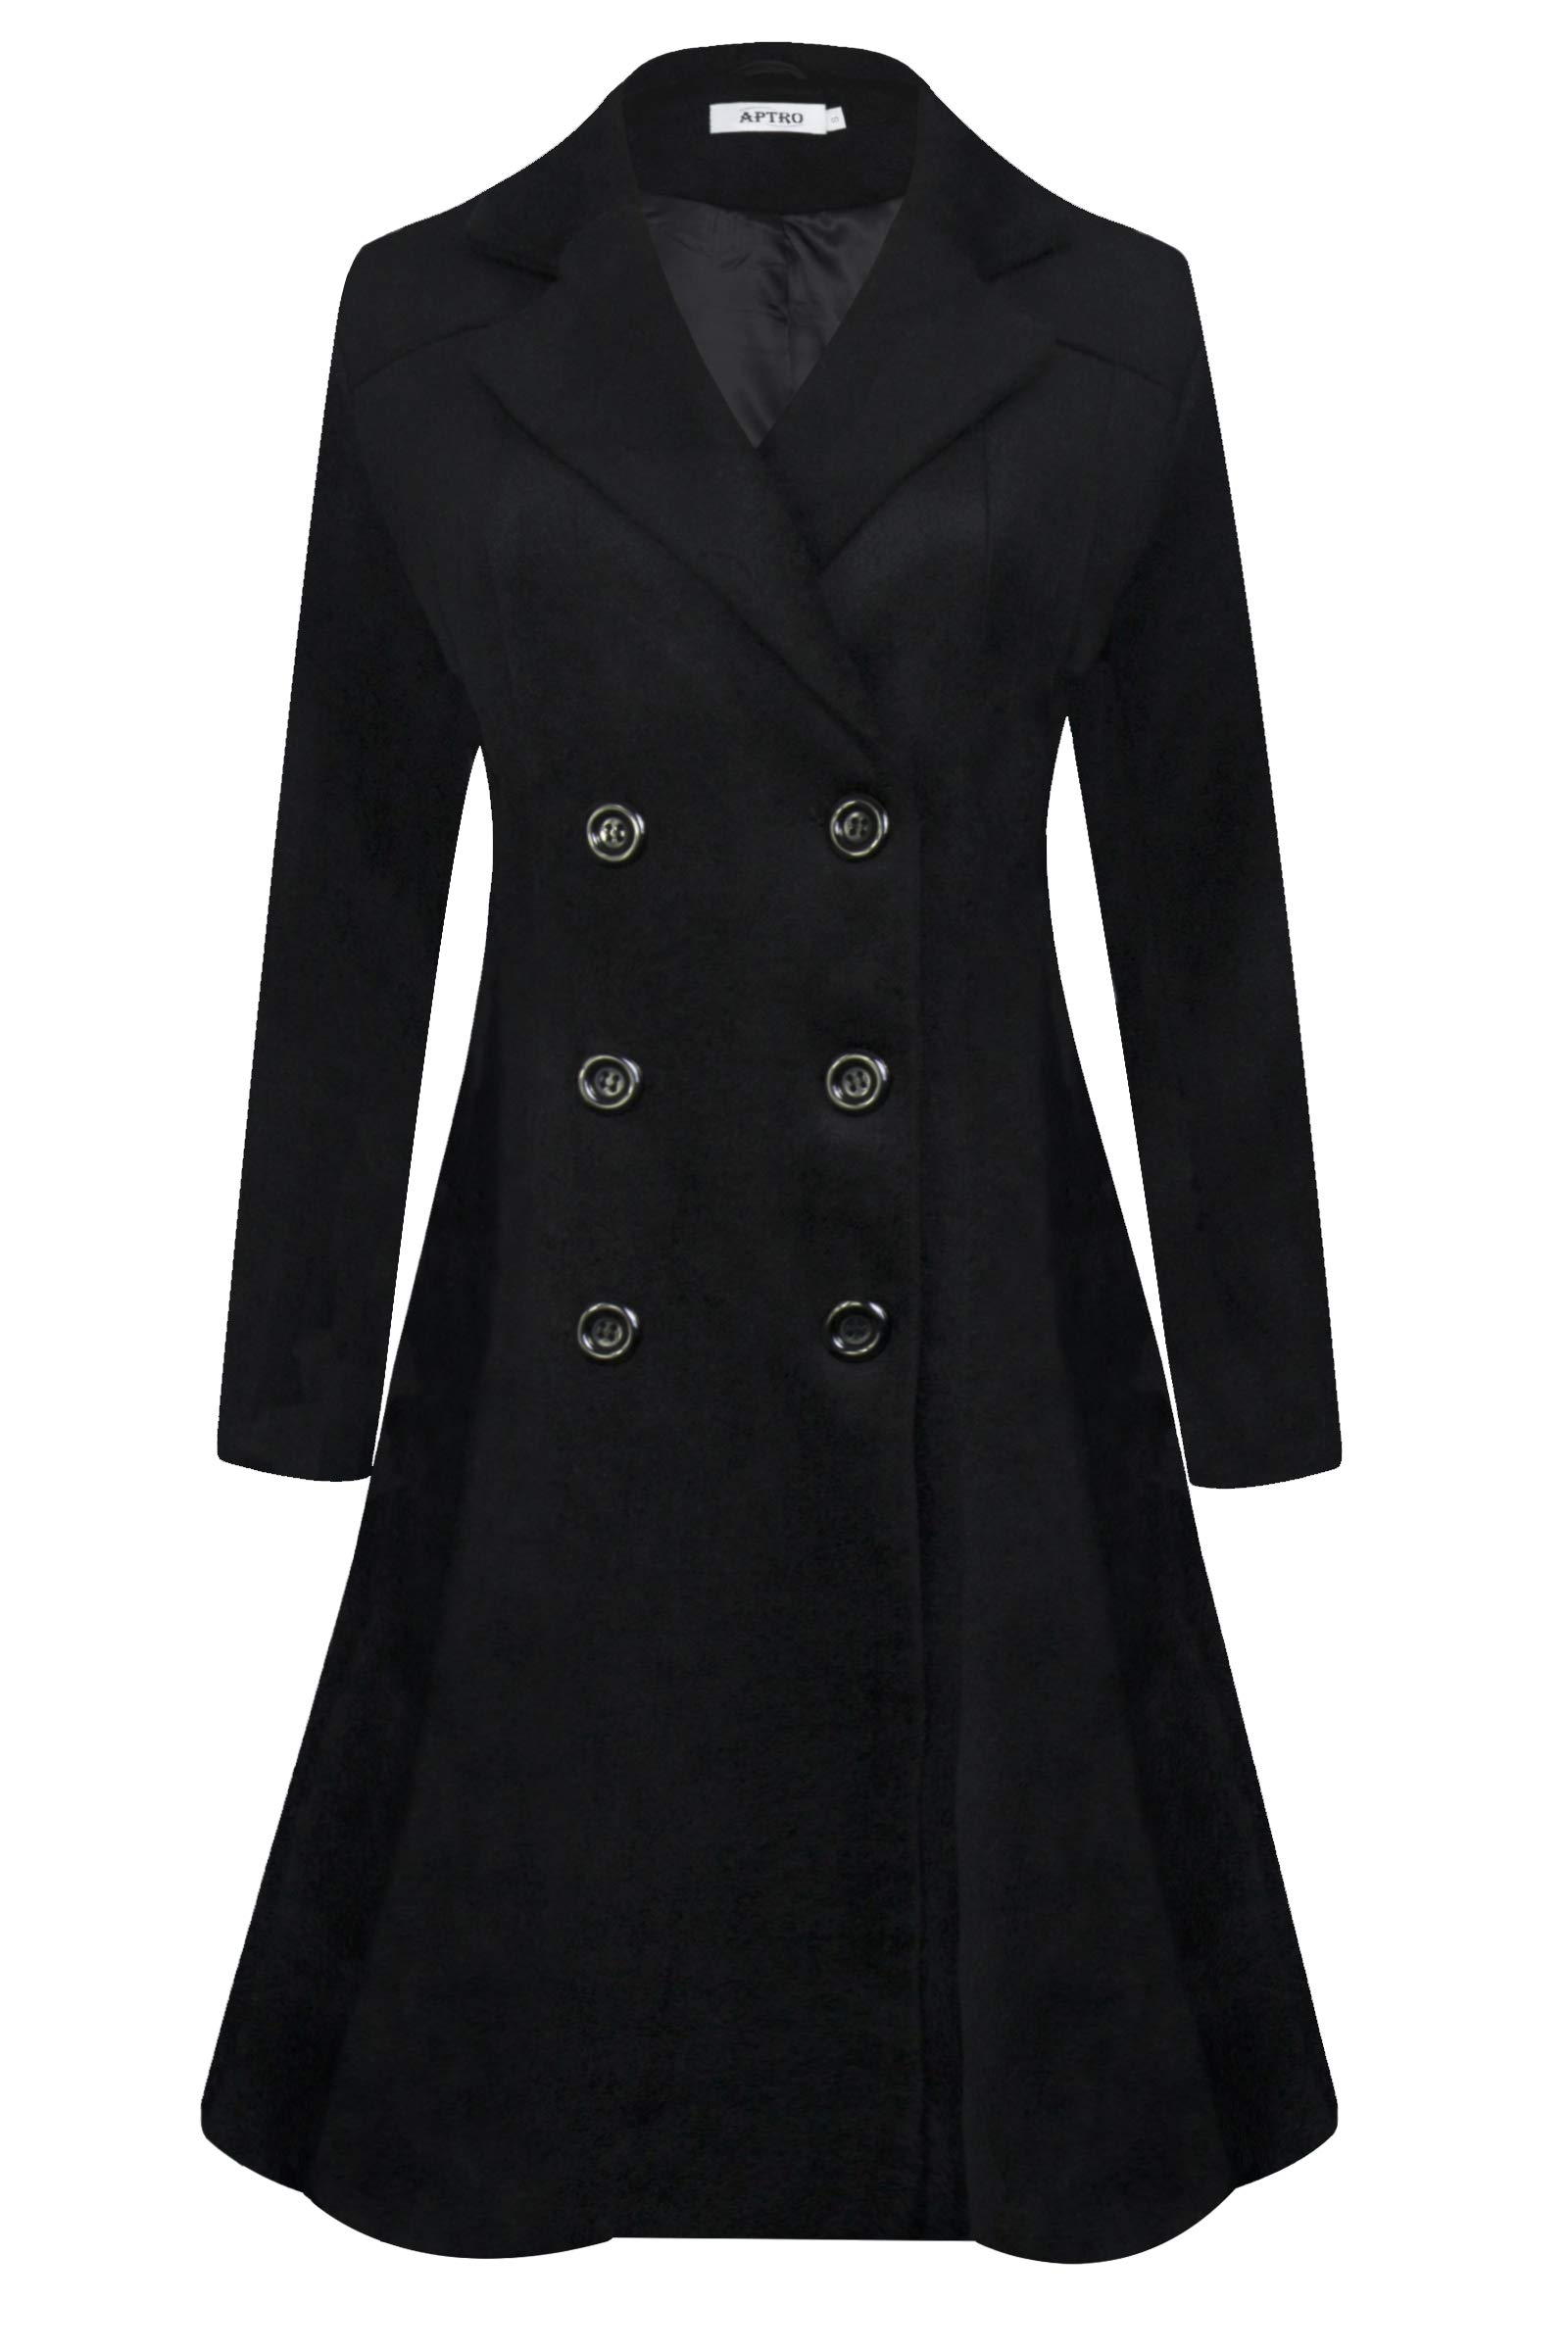 APTRO Women's Winter Trench Coat Long Lapel Double Breasted Wool Pea Coat WS02 (Medium, WS02 Black)